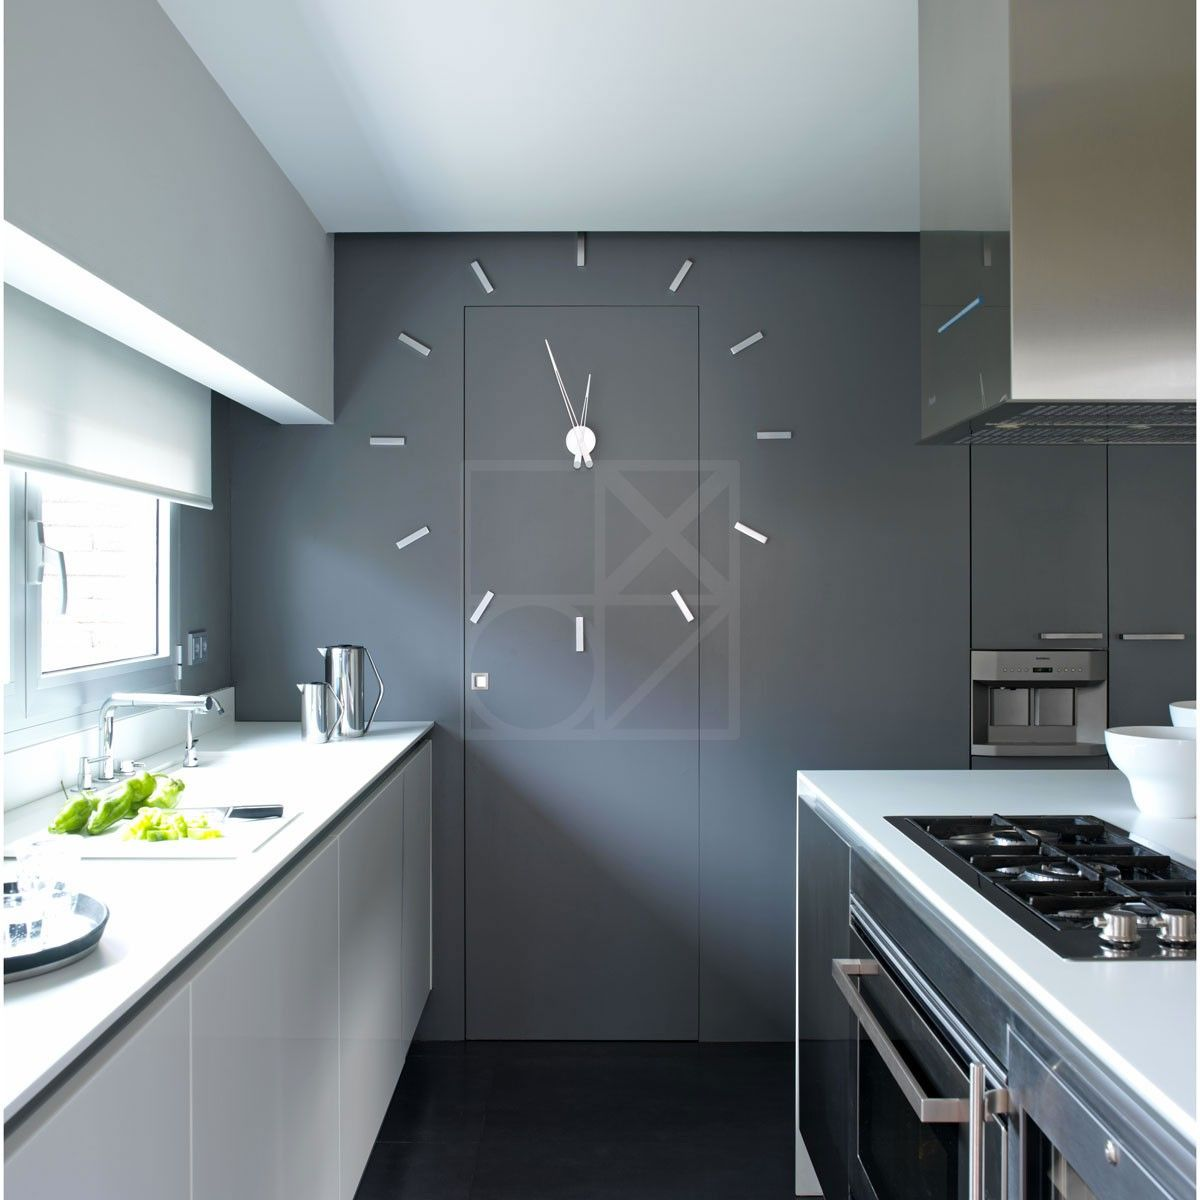 horloge murale design horloge nomon tacon 12 quelle. Black Bedroom Furniture Sets. Home Design Ideas